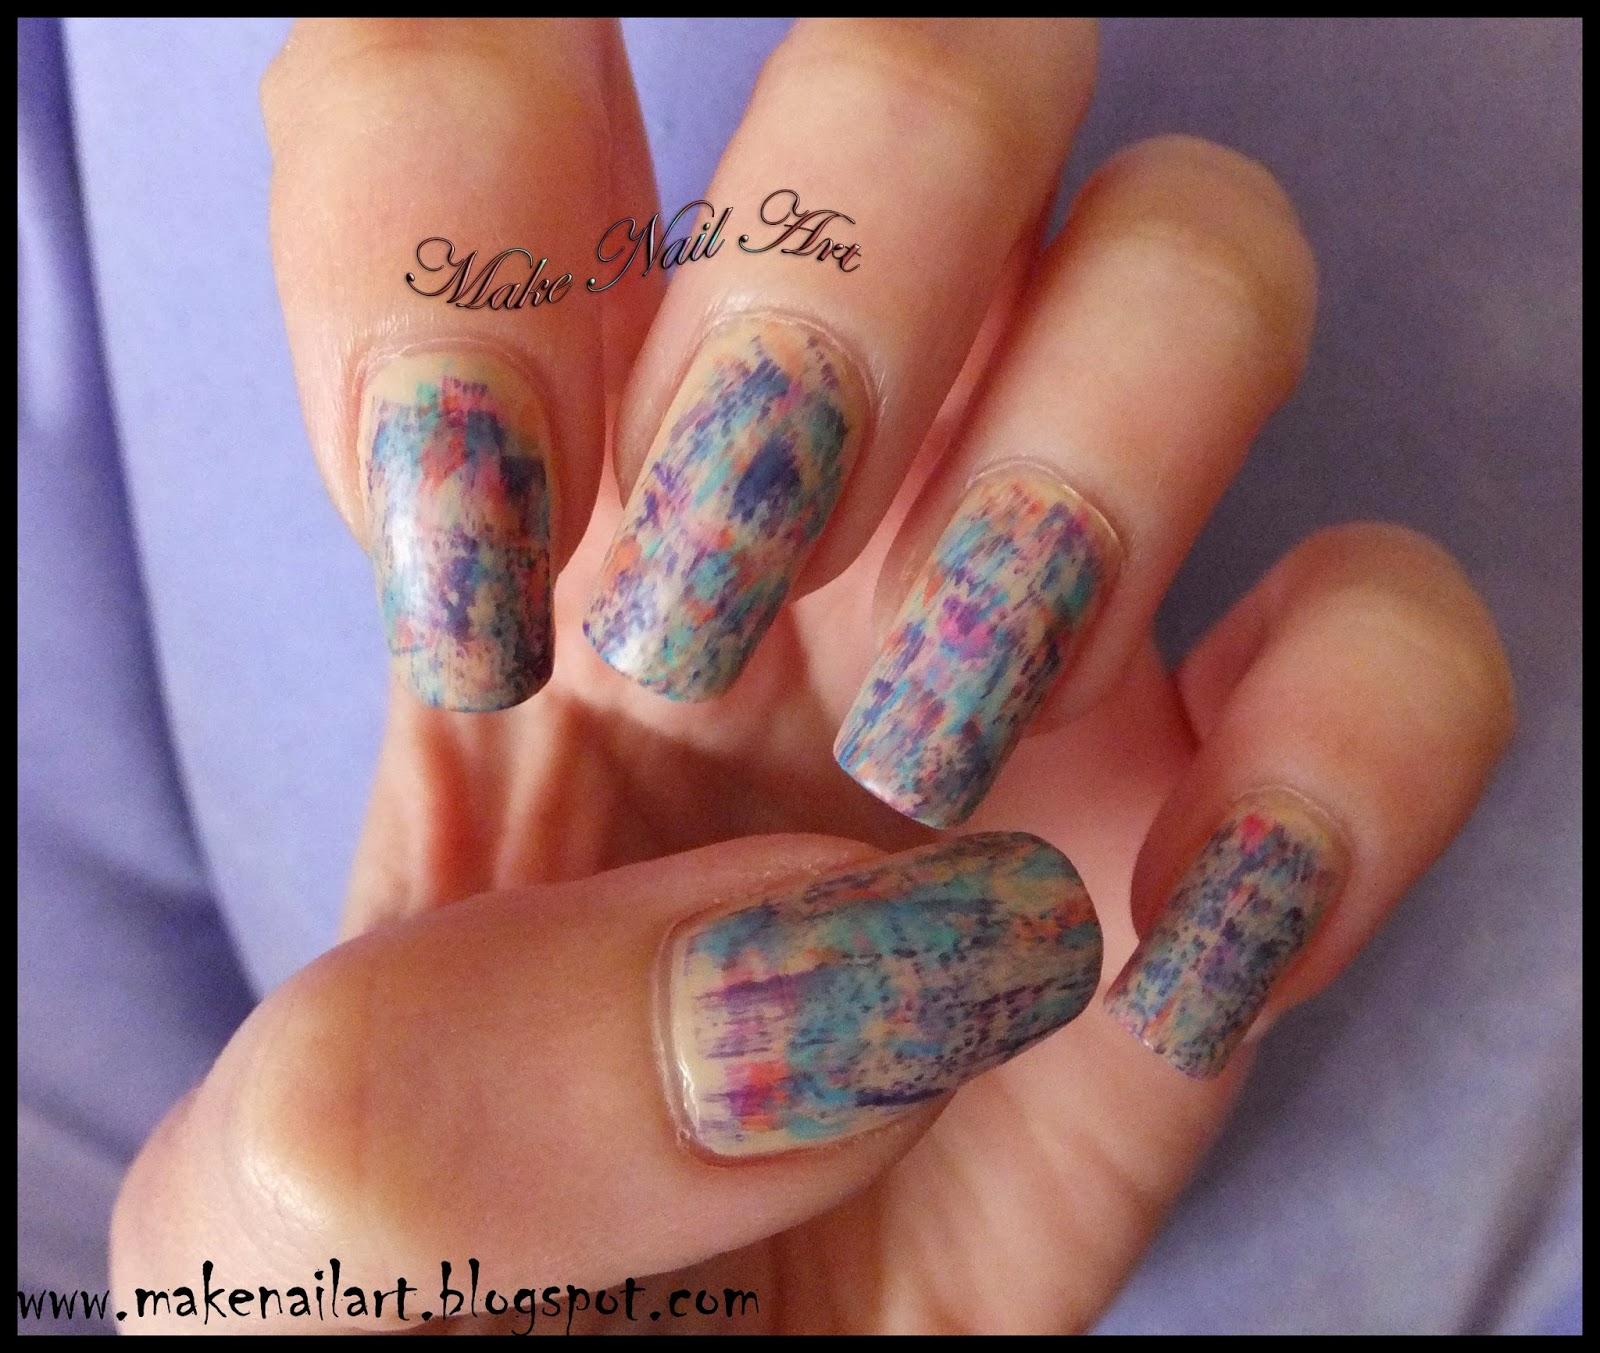 Make Nail Art: Distressed Pastel Matte Spring Nails Nail Art ...